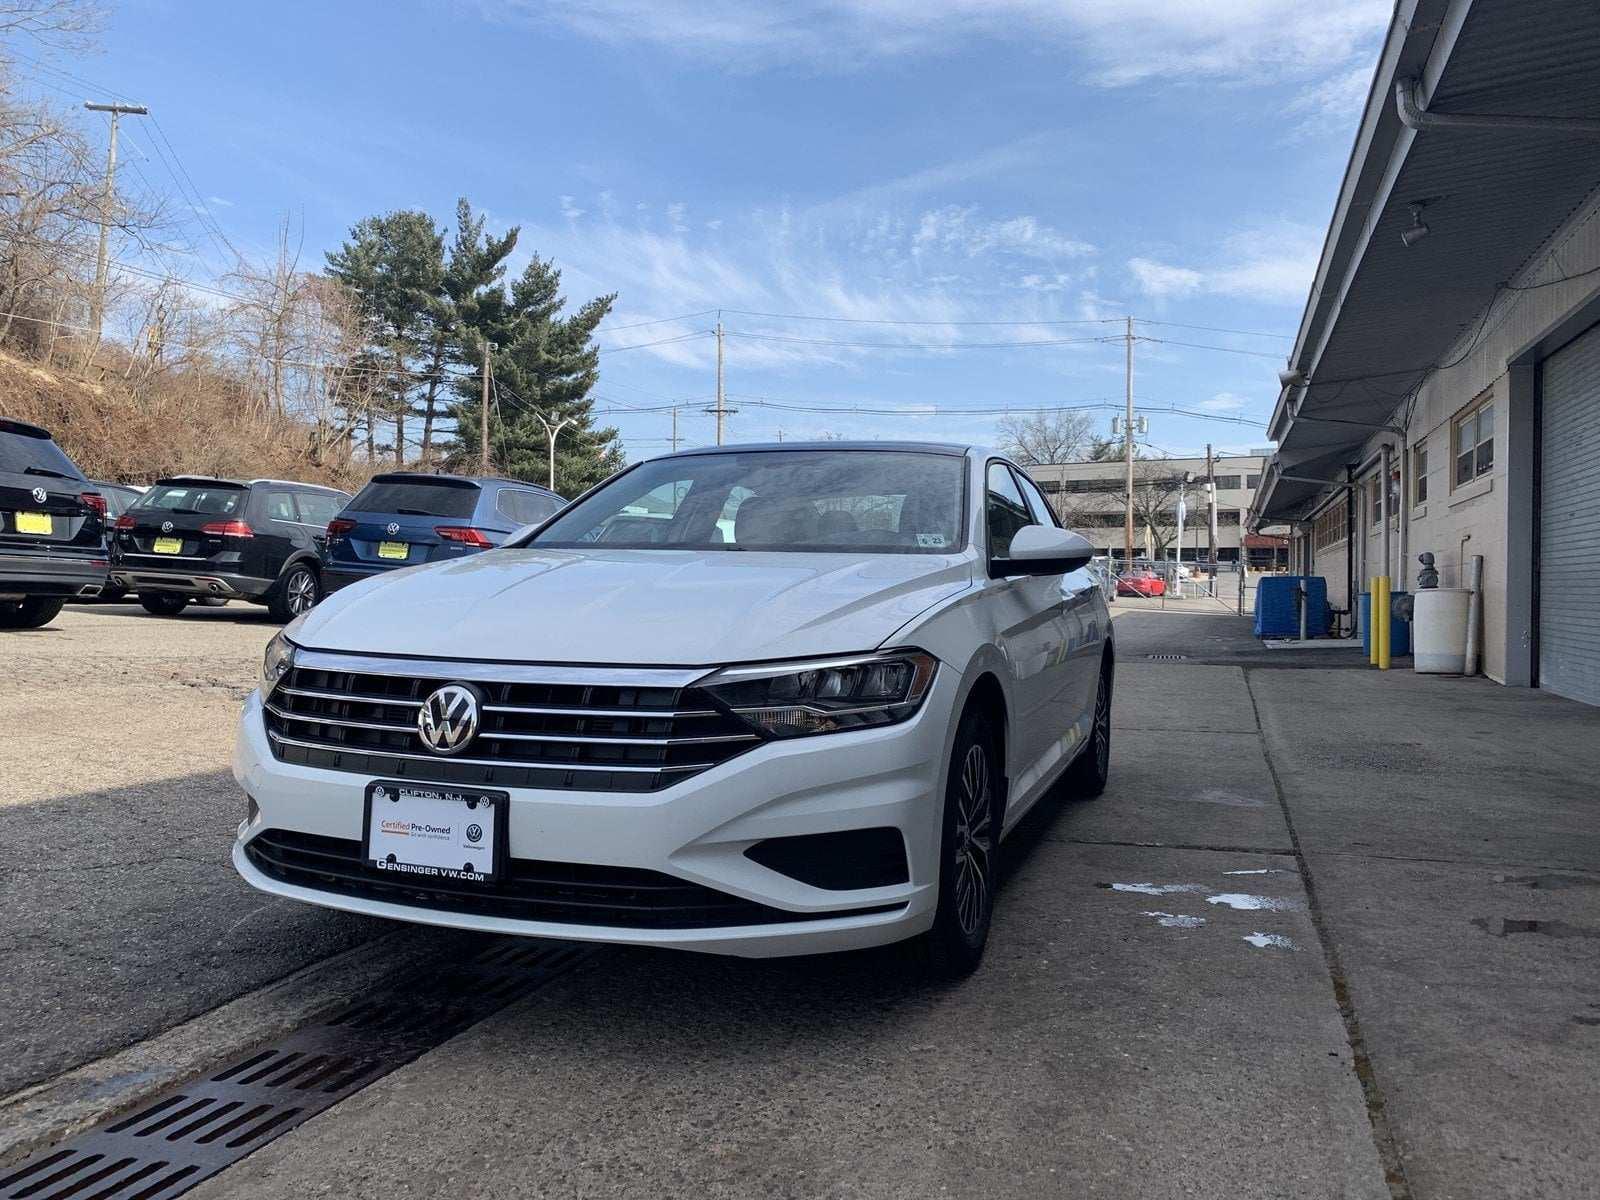 91 All New 2019 Volkswagen Jetta Vin Model by 2019 Volkswagen Jetta Vin